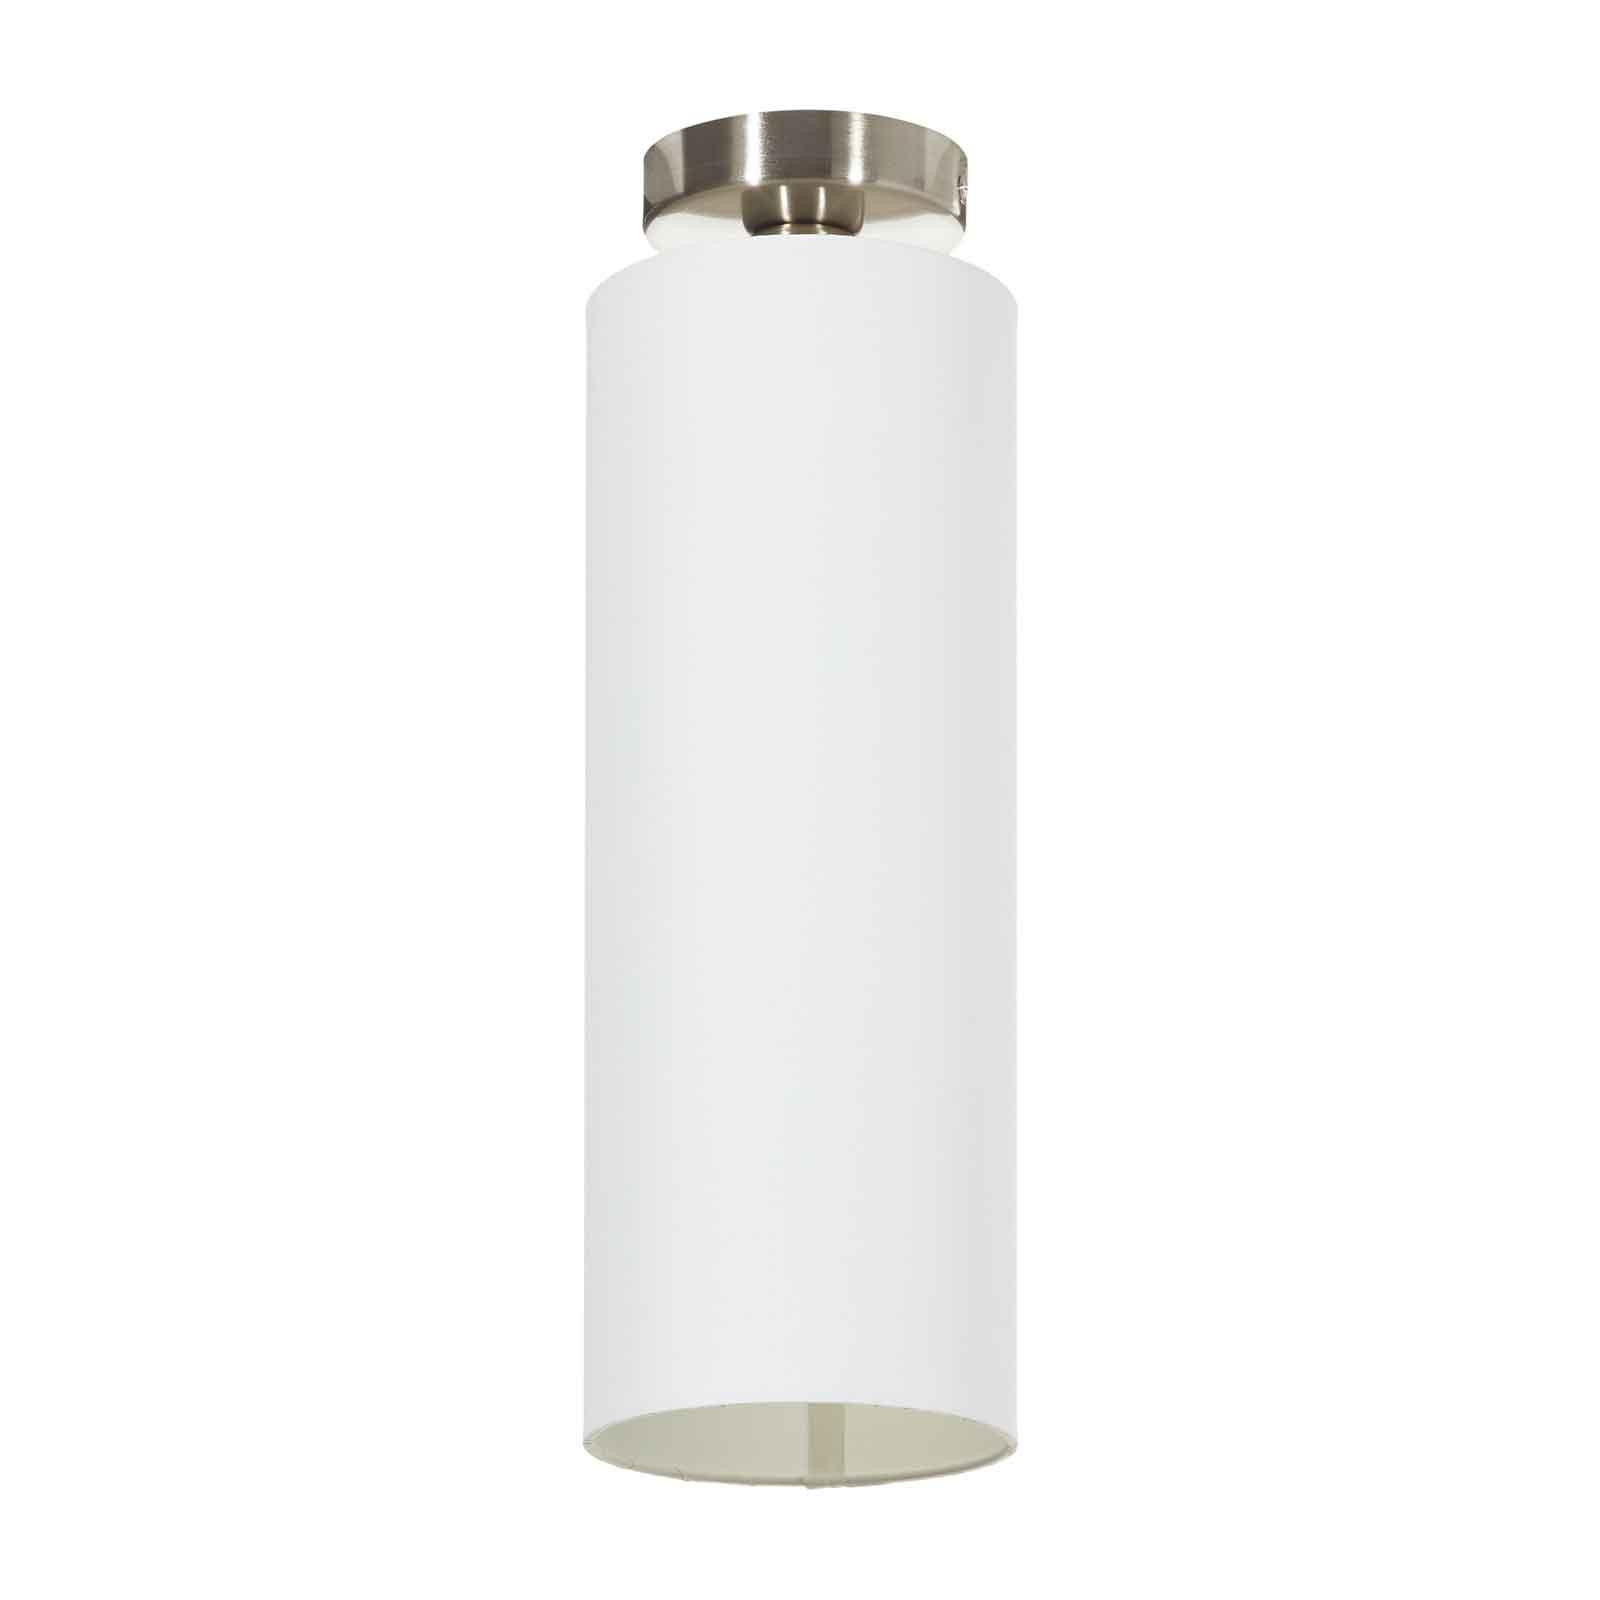 Lucande Patrik textiel-plafondlamp Ø15cm wit